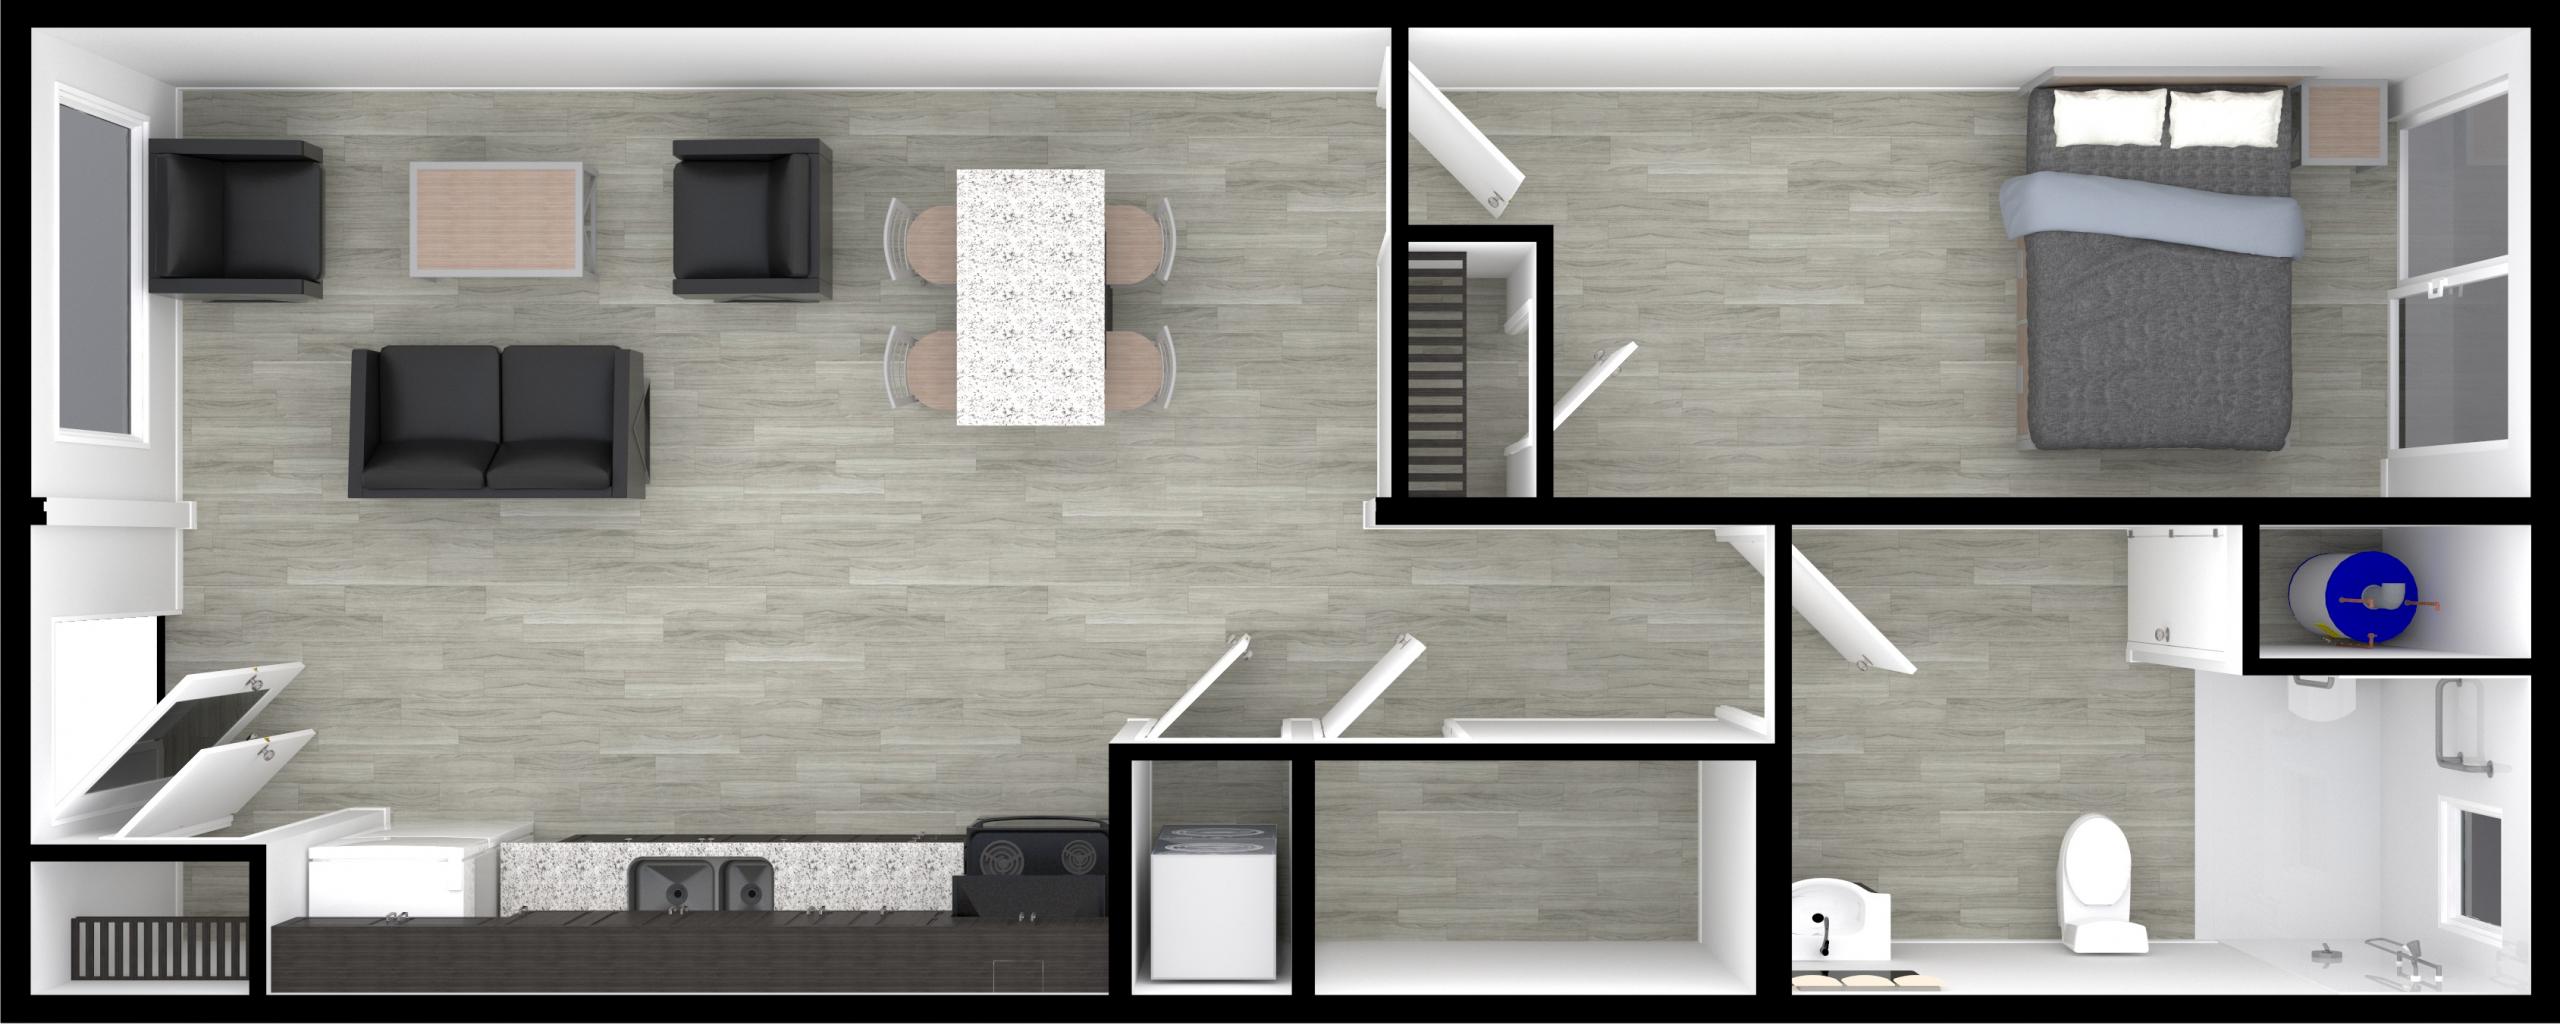 NOW Housing Single Bedroom